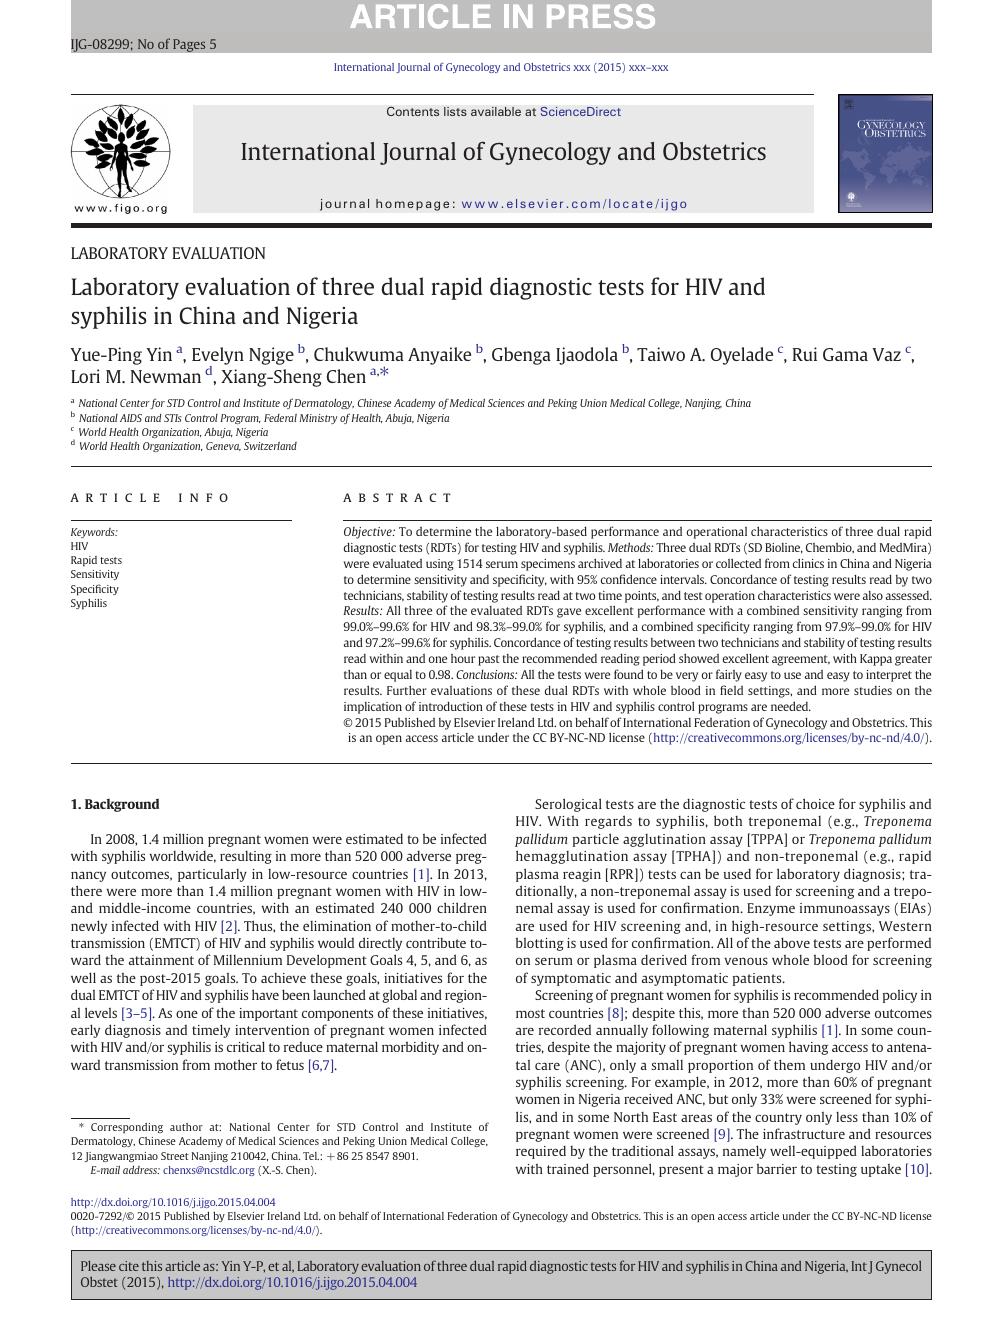 Laboratory evaluation of three dual rapid diagnostic tests